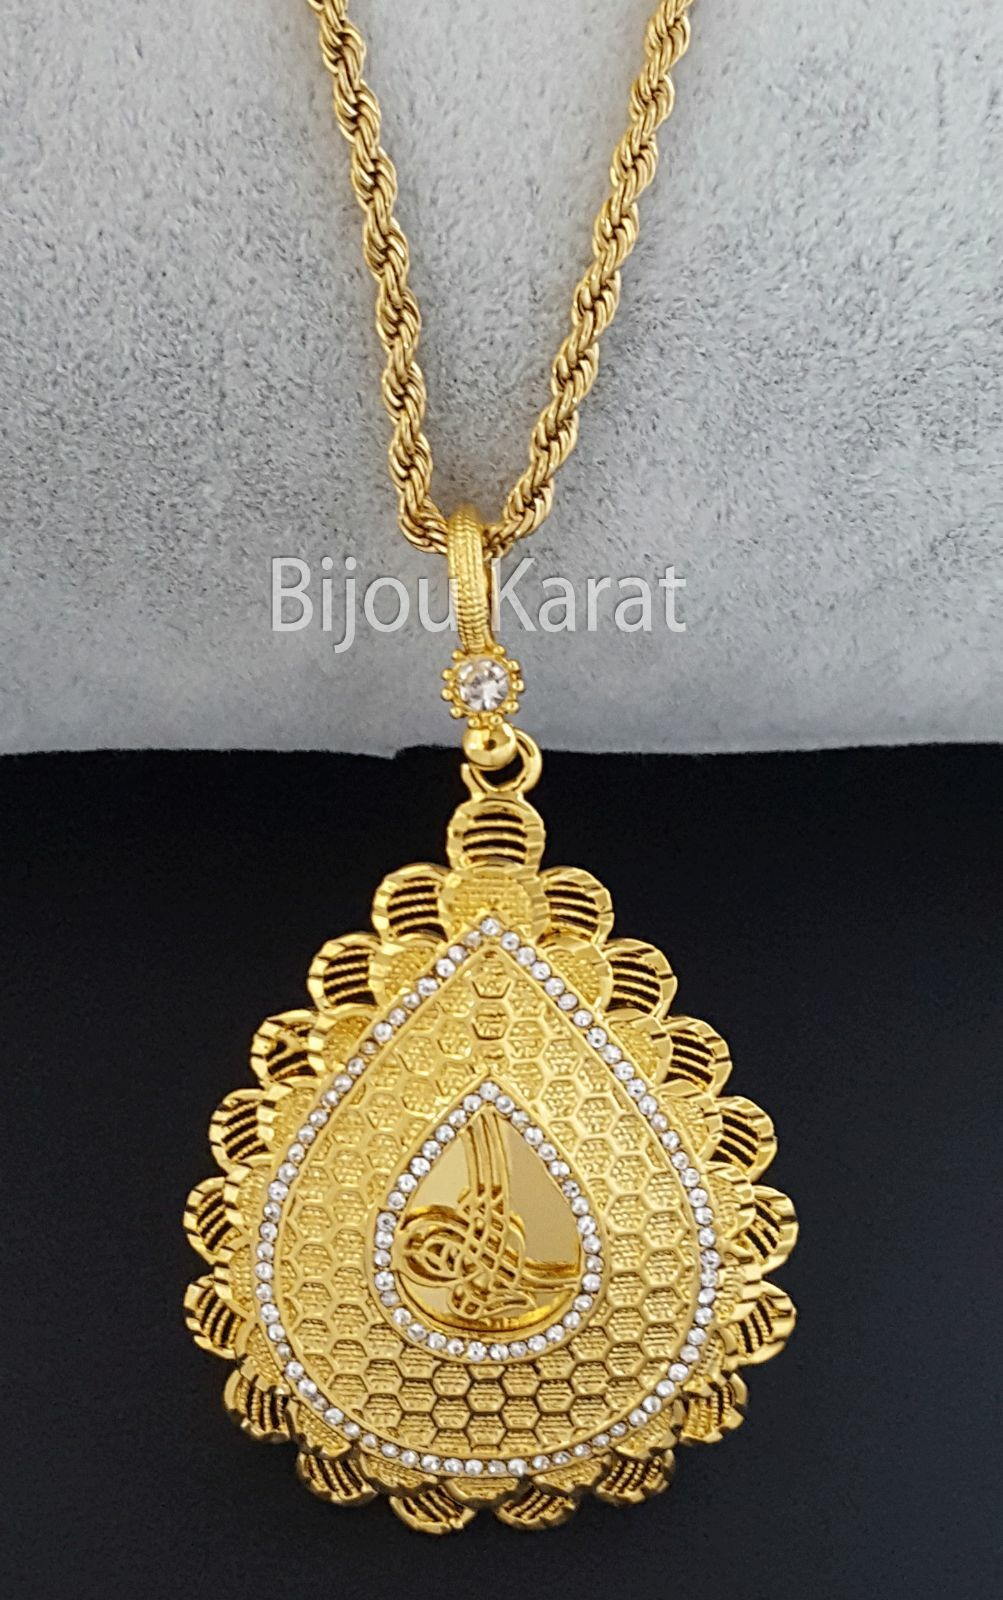 Osmanli Tugra ALTINI kolye ceyrek 24 CARATI GP Altin zincir COLLANA IN gold TAKI